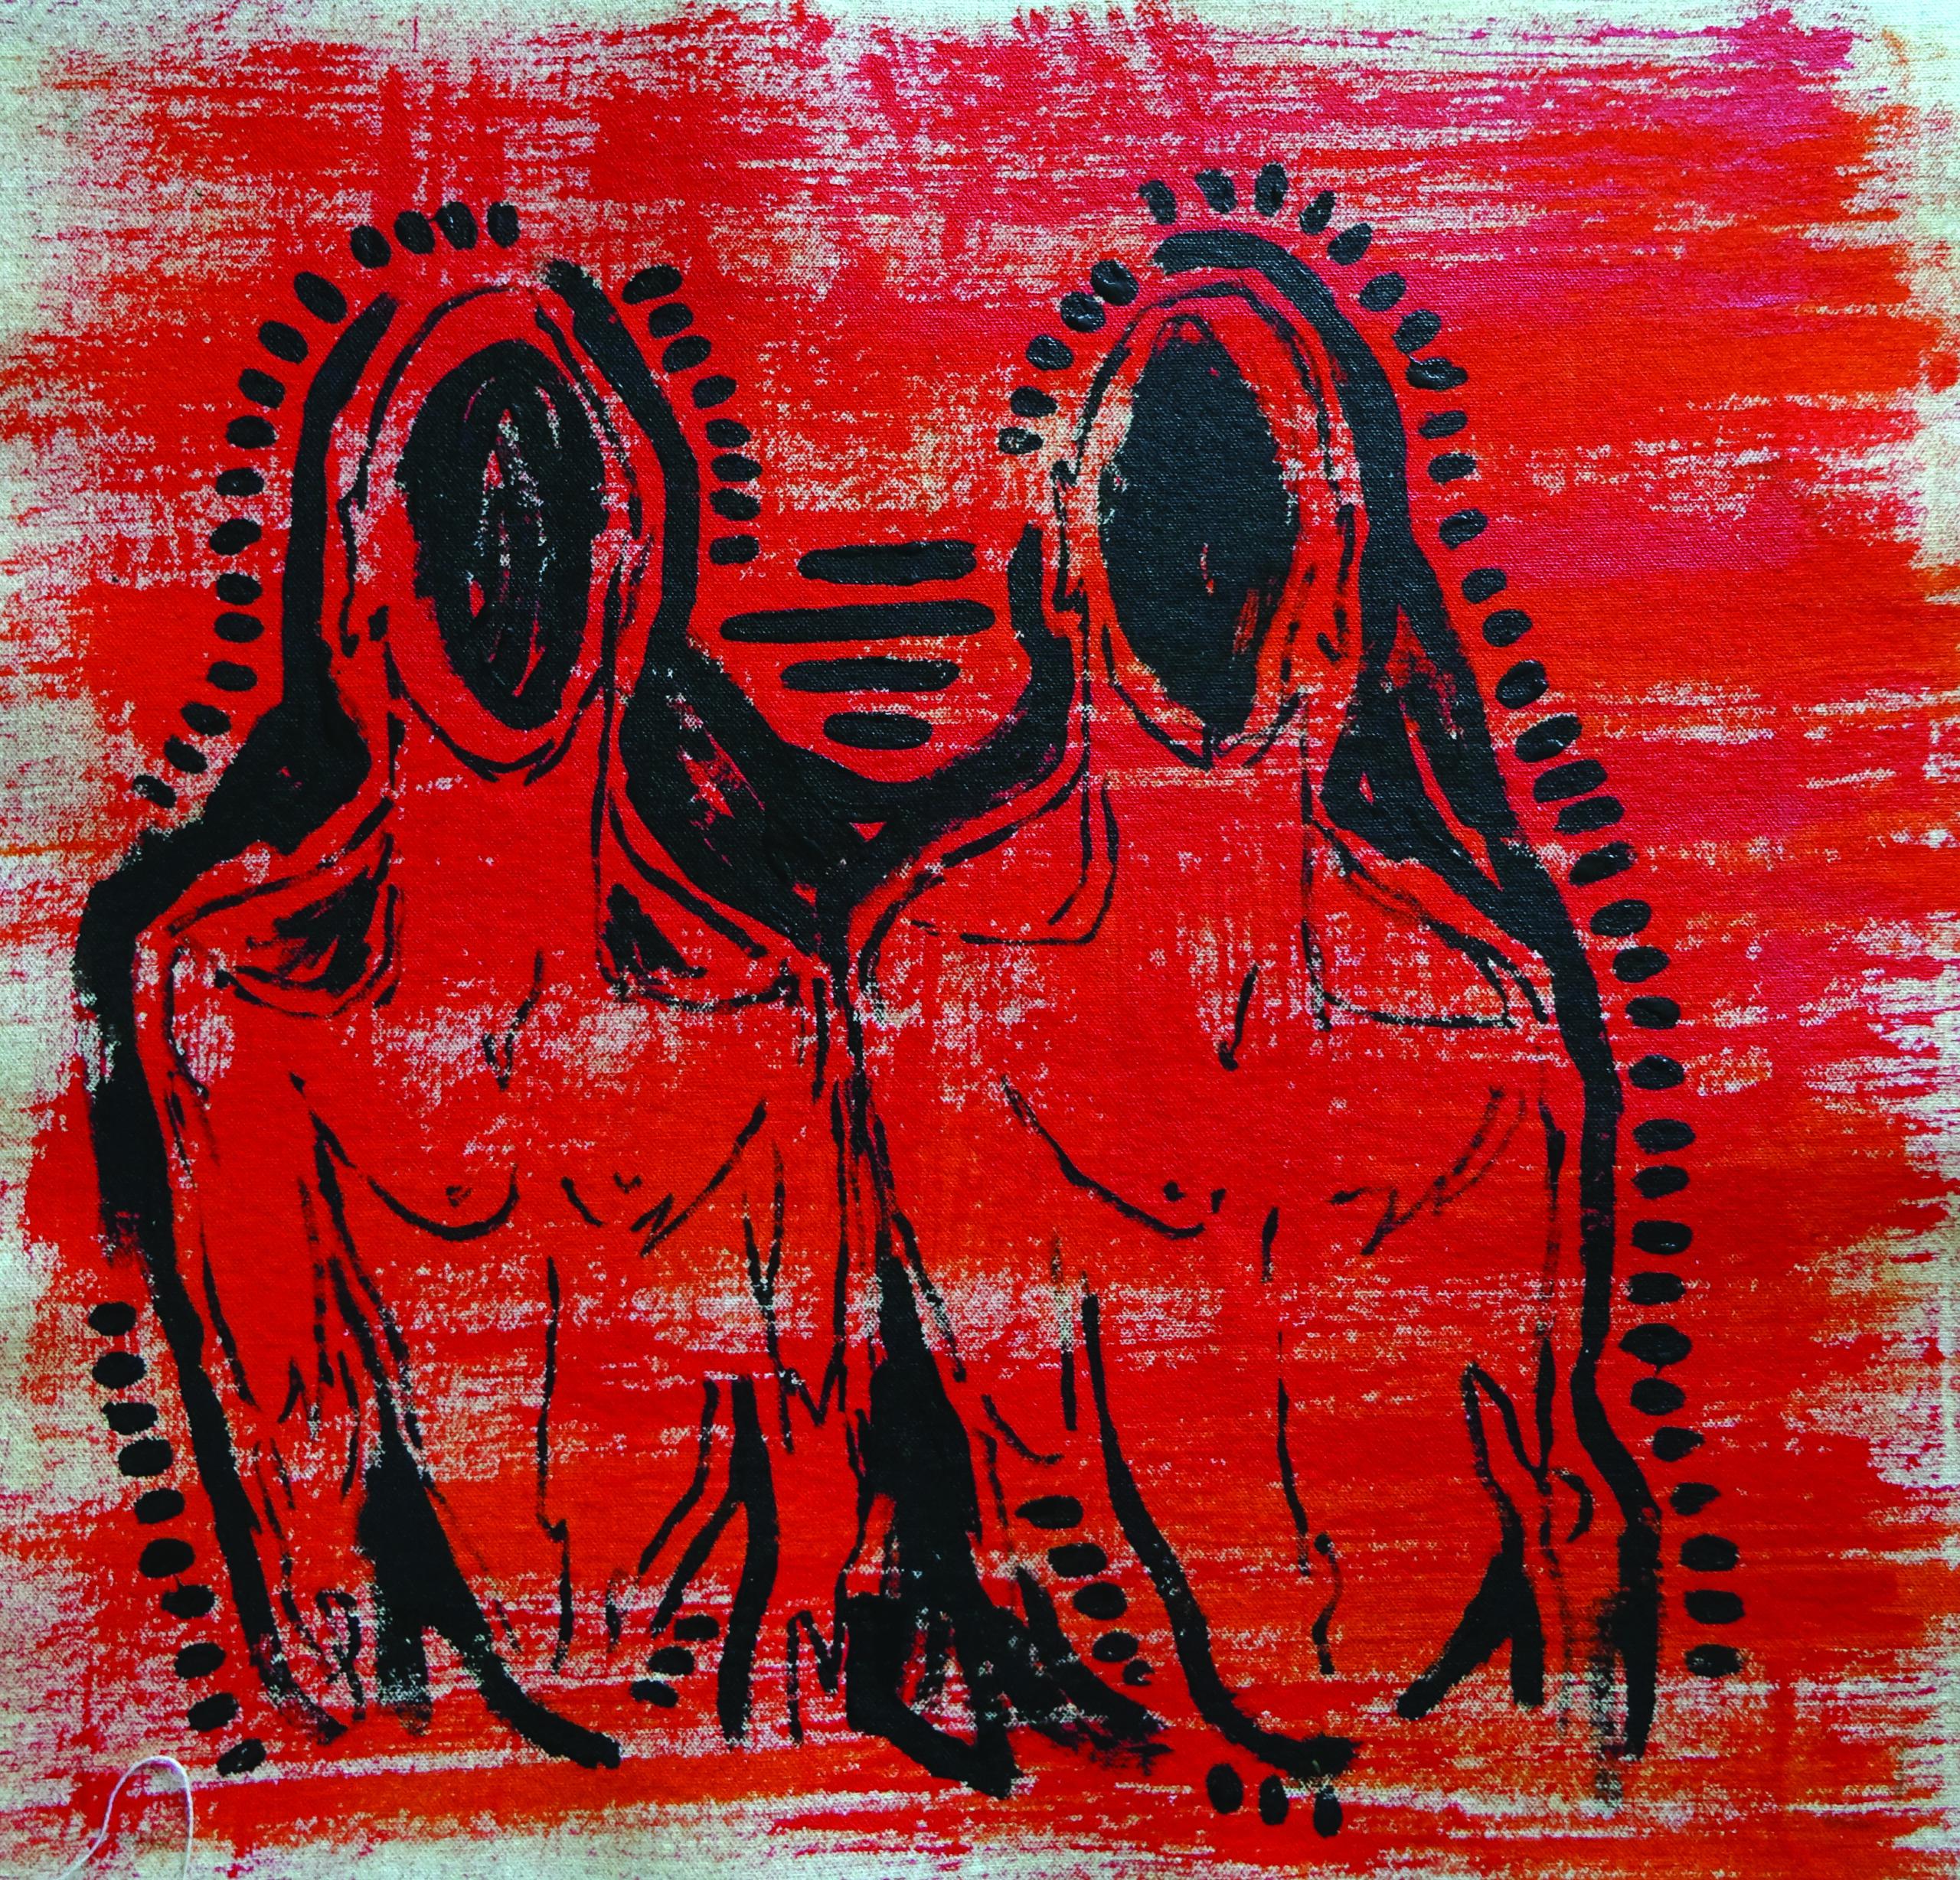 Patrick Church - Never Alone